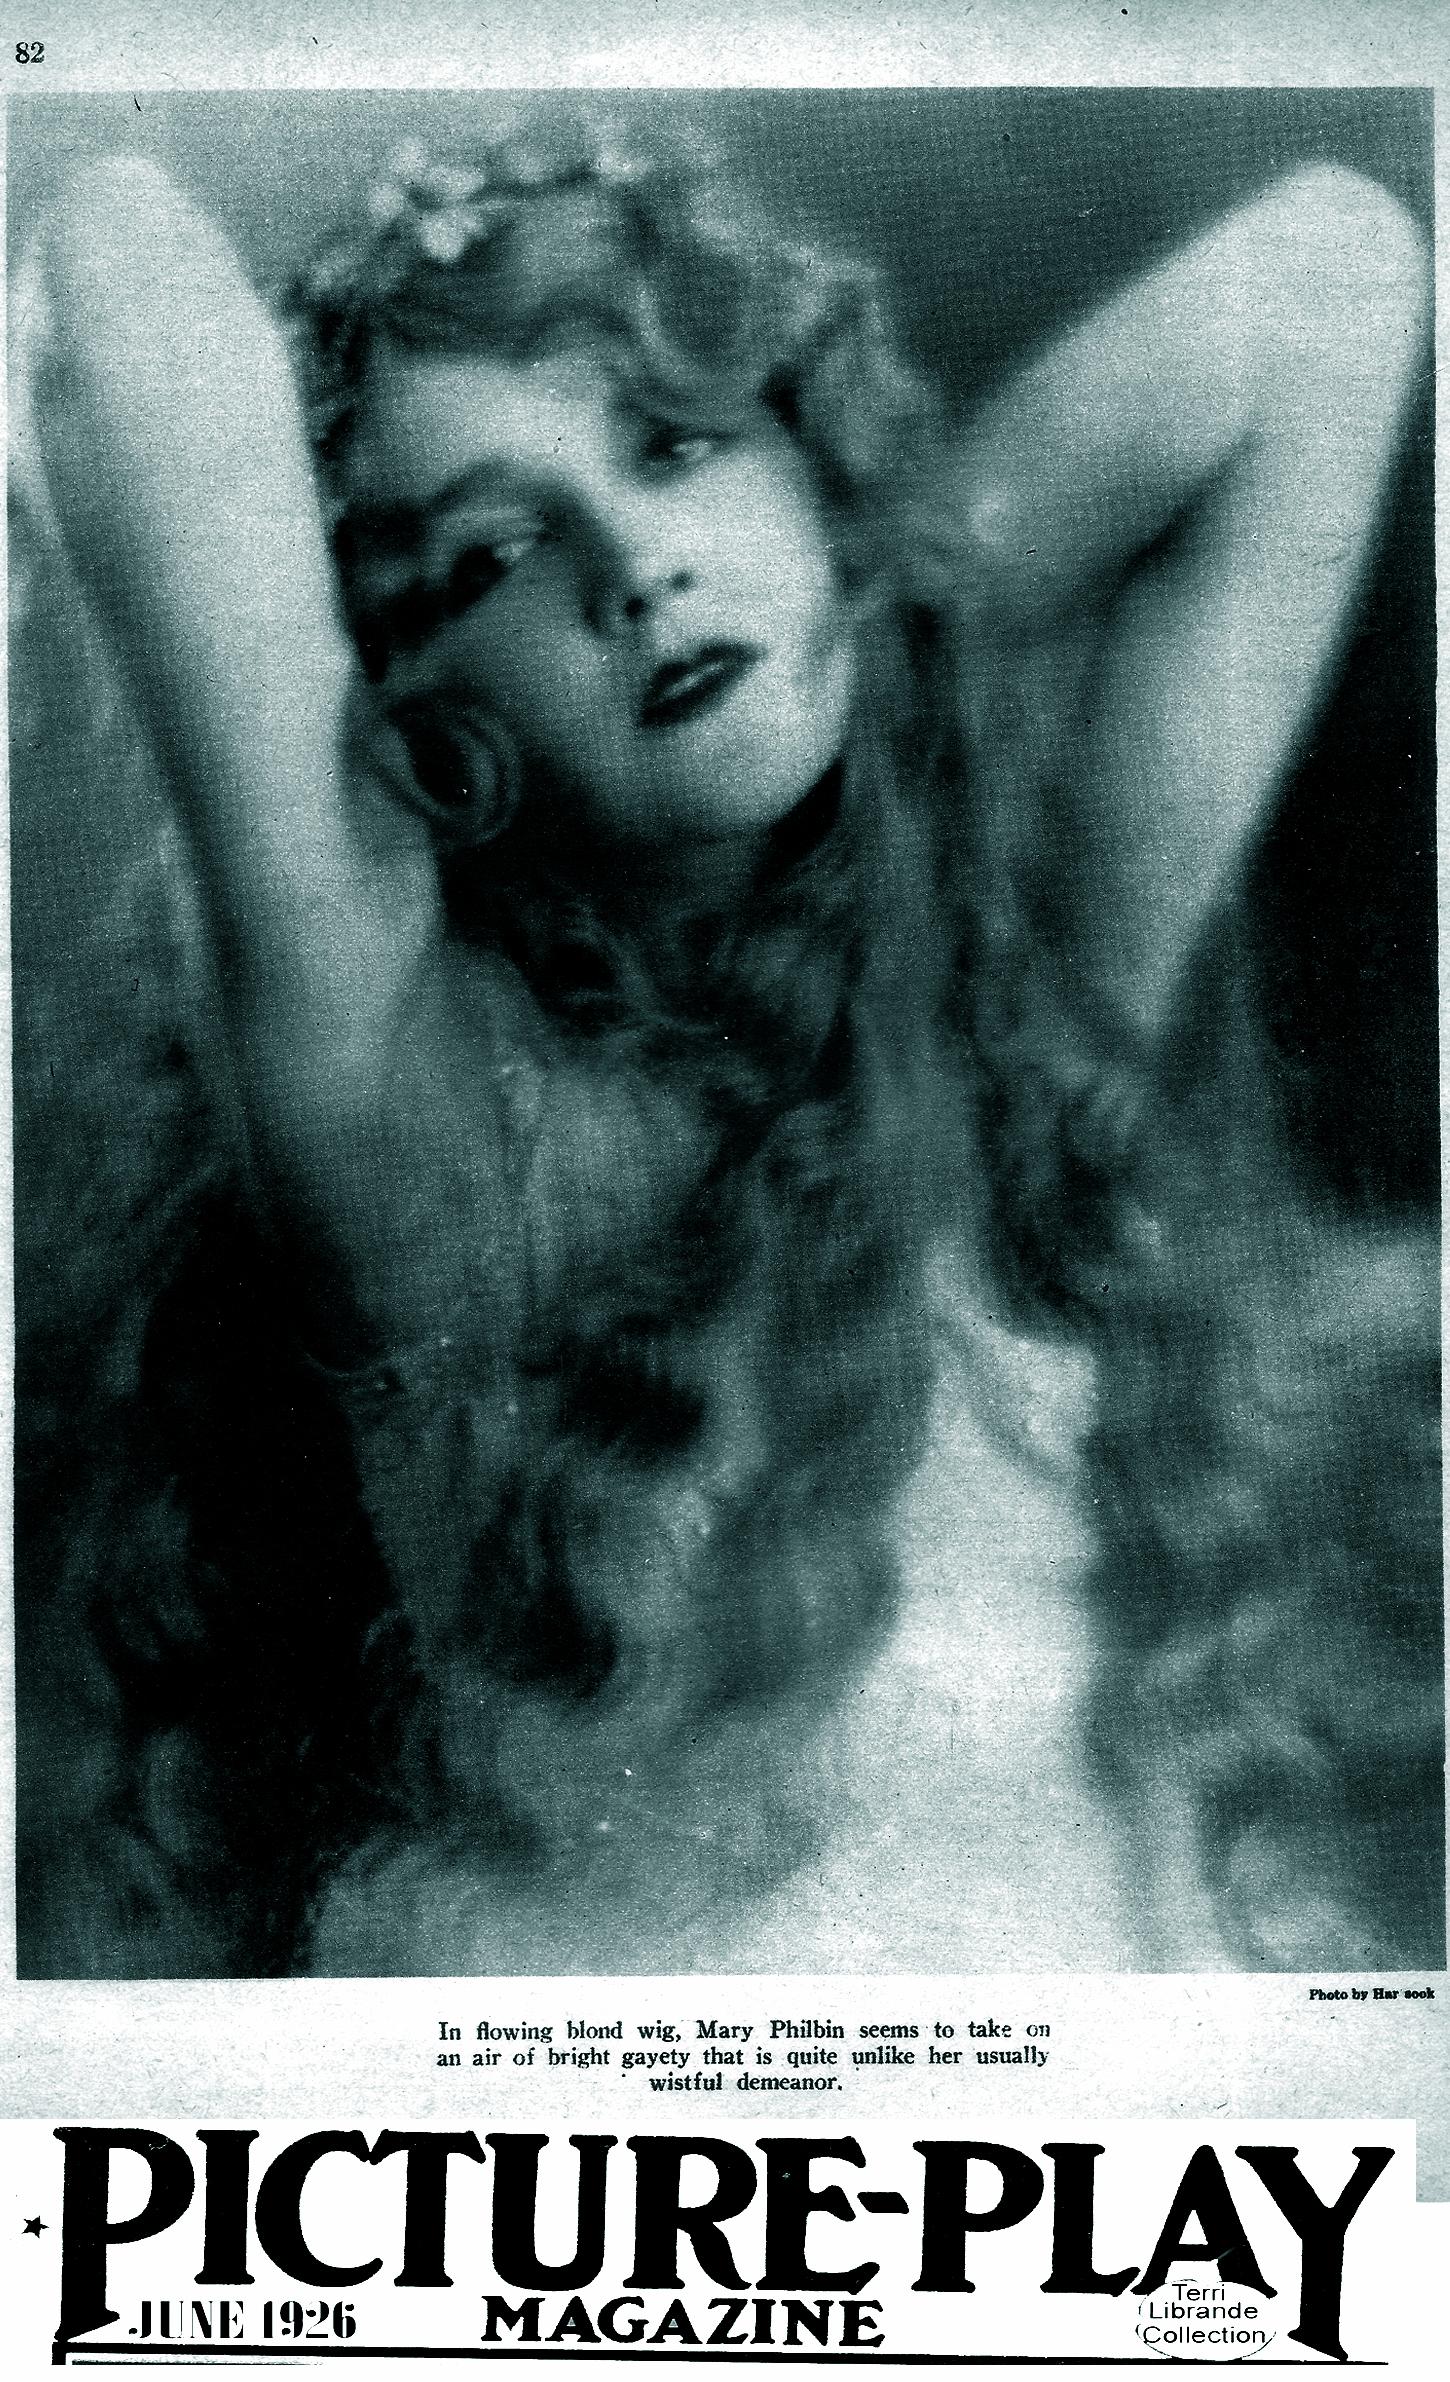 Barbara Everest,Ginette Reno Sex image Tamara Bernier Evans,Gordon Pinsent